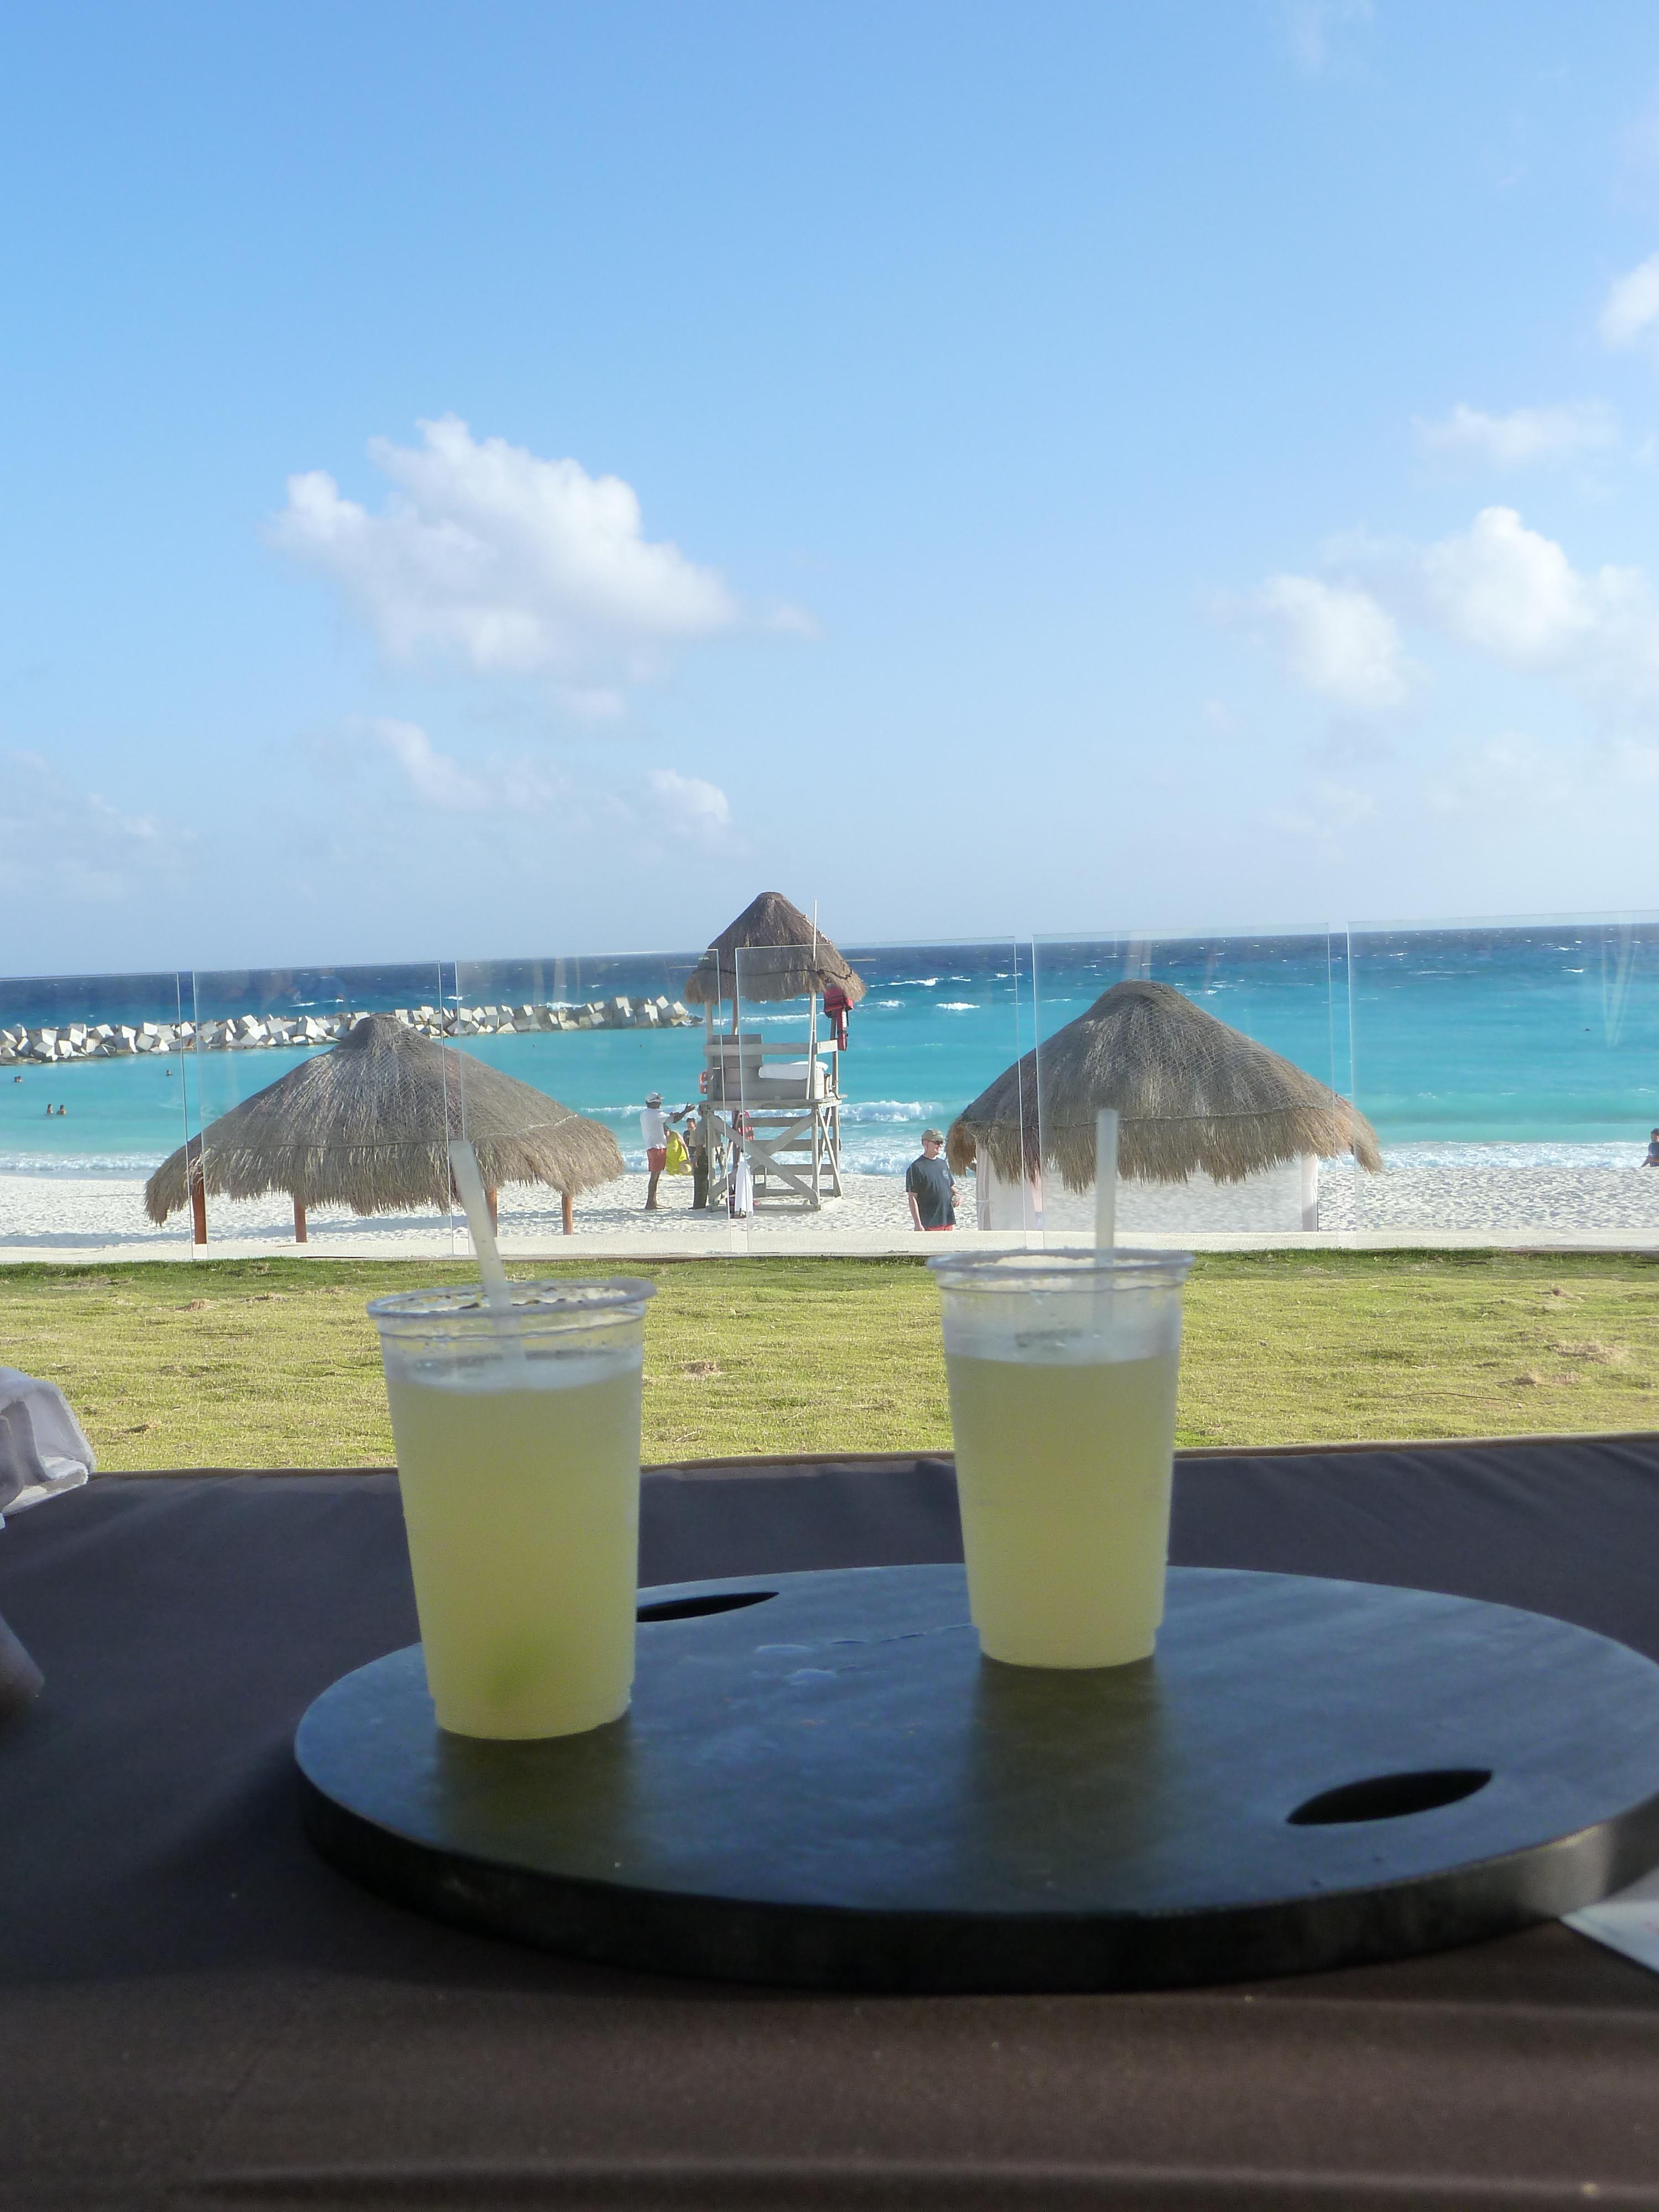 How To Choose A Hotel In Cancun Bashfuladventurer Com